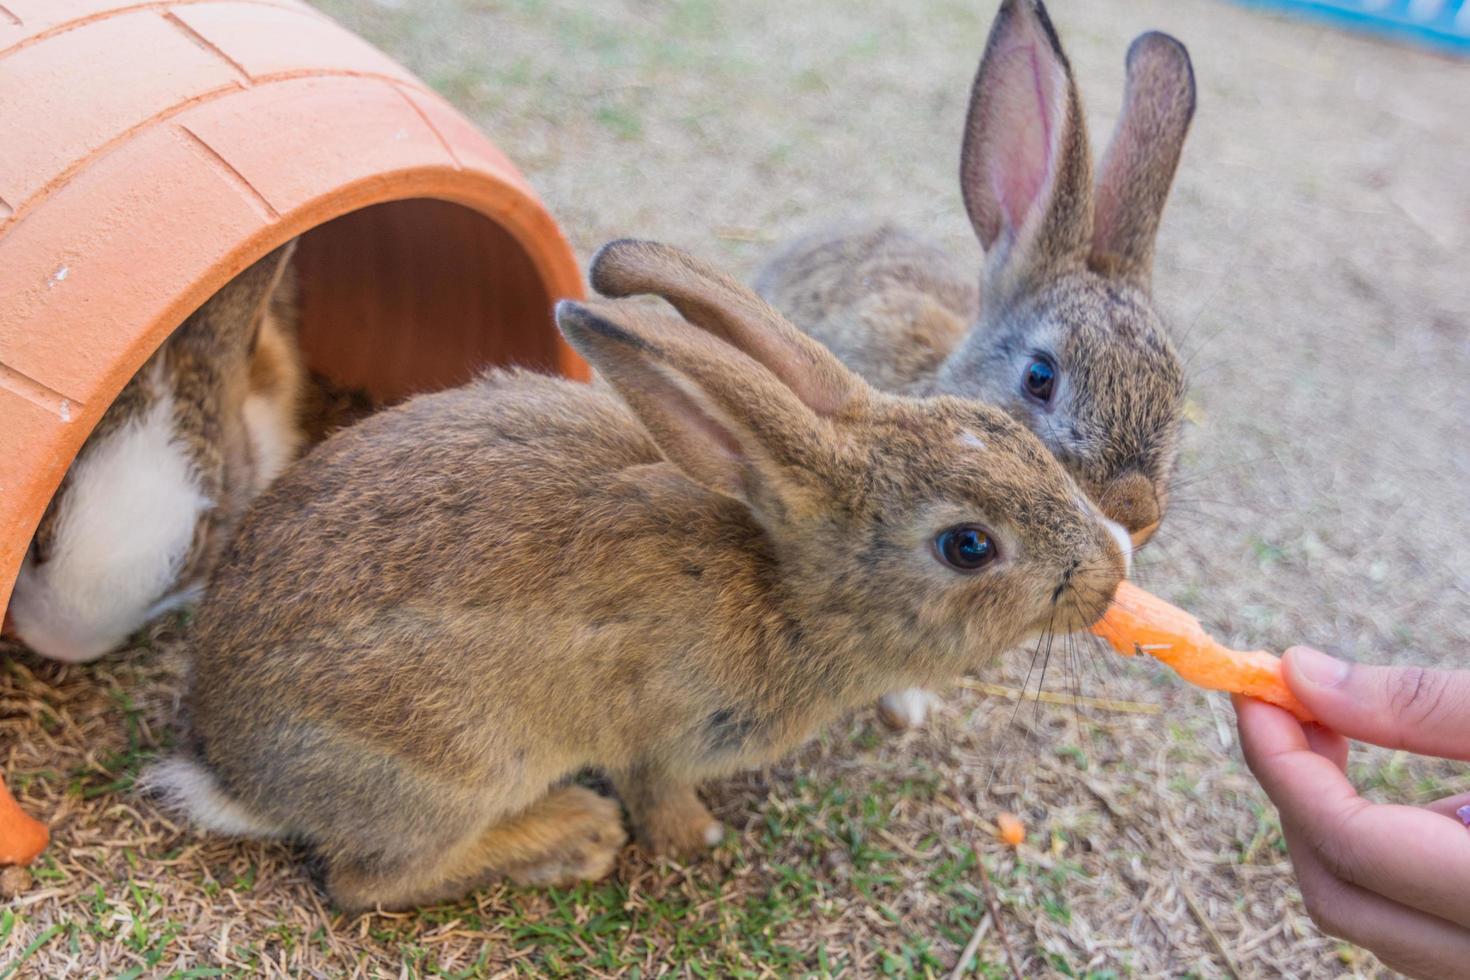 Rabbit eats carrot photo